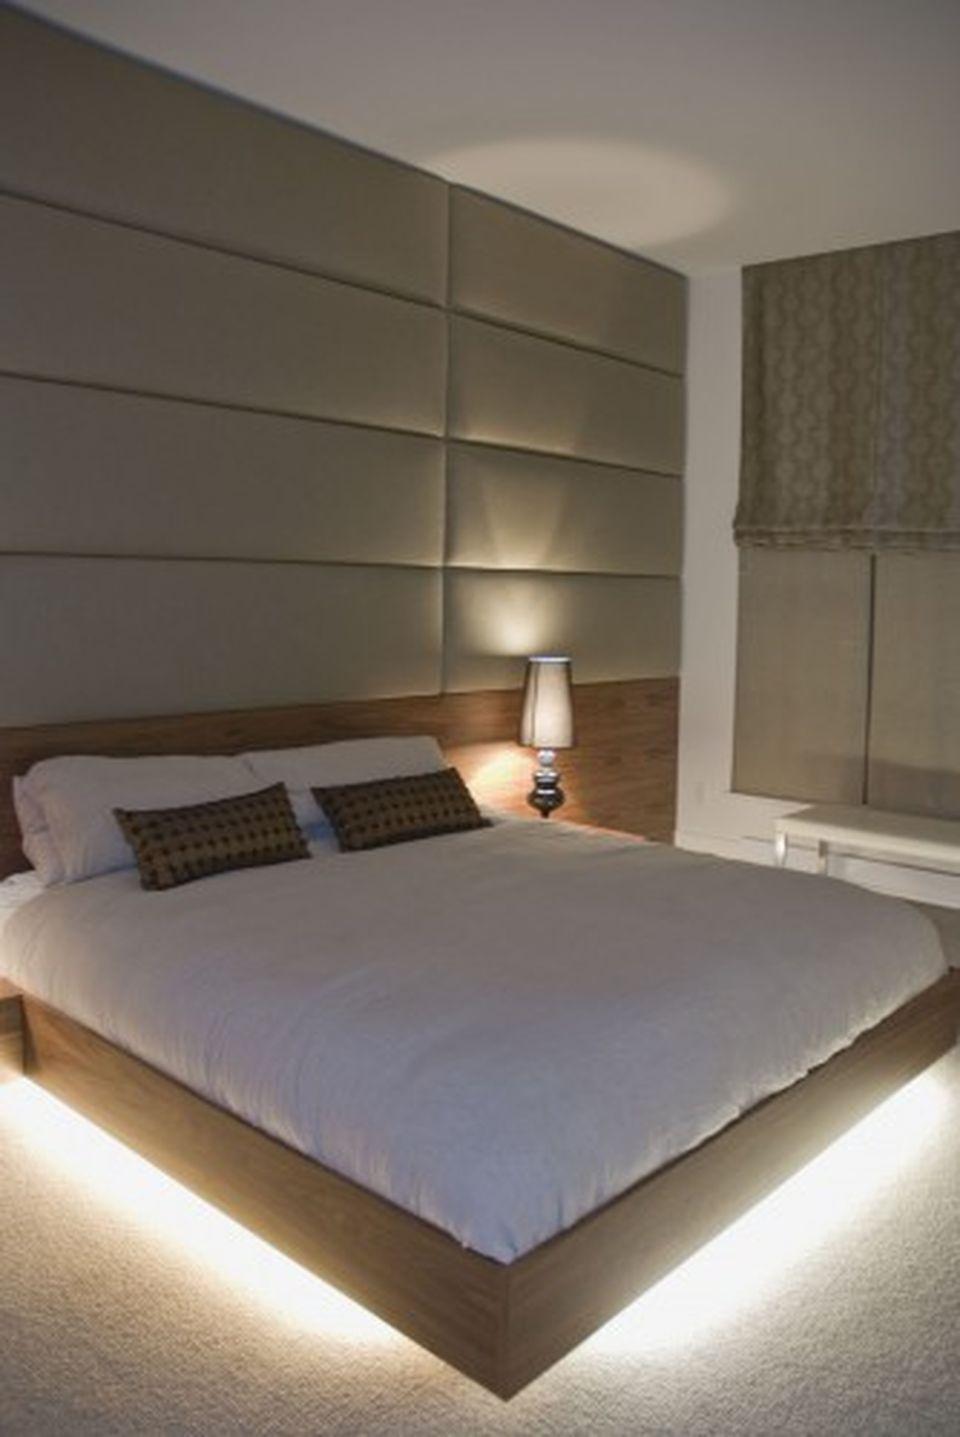 Amazing Modern Floating Bed Design With Under Light Hoommy Com Modern Bedroom Contemporary Bedroom Bed Design